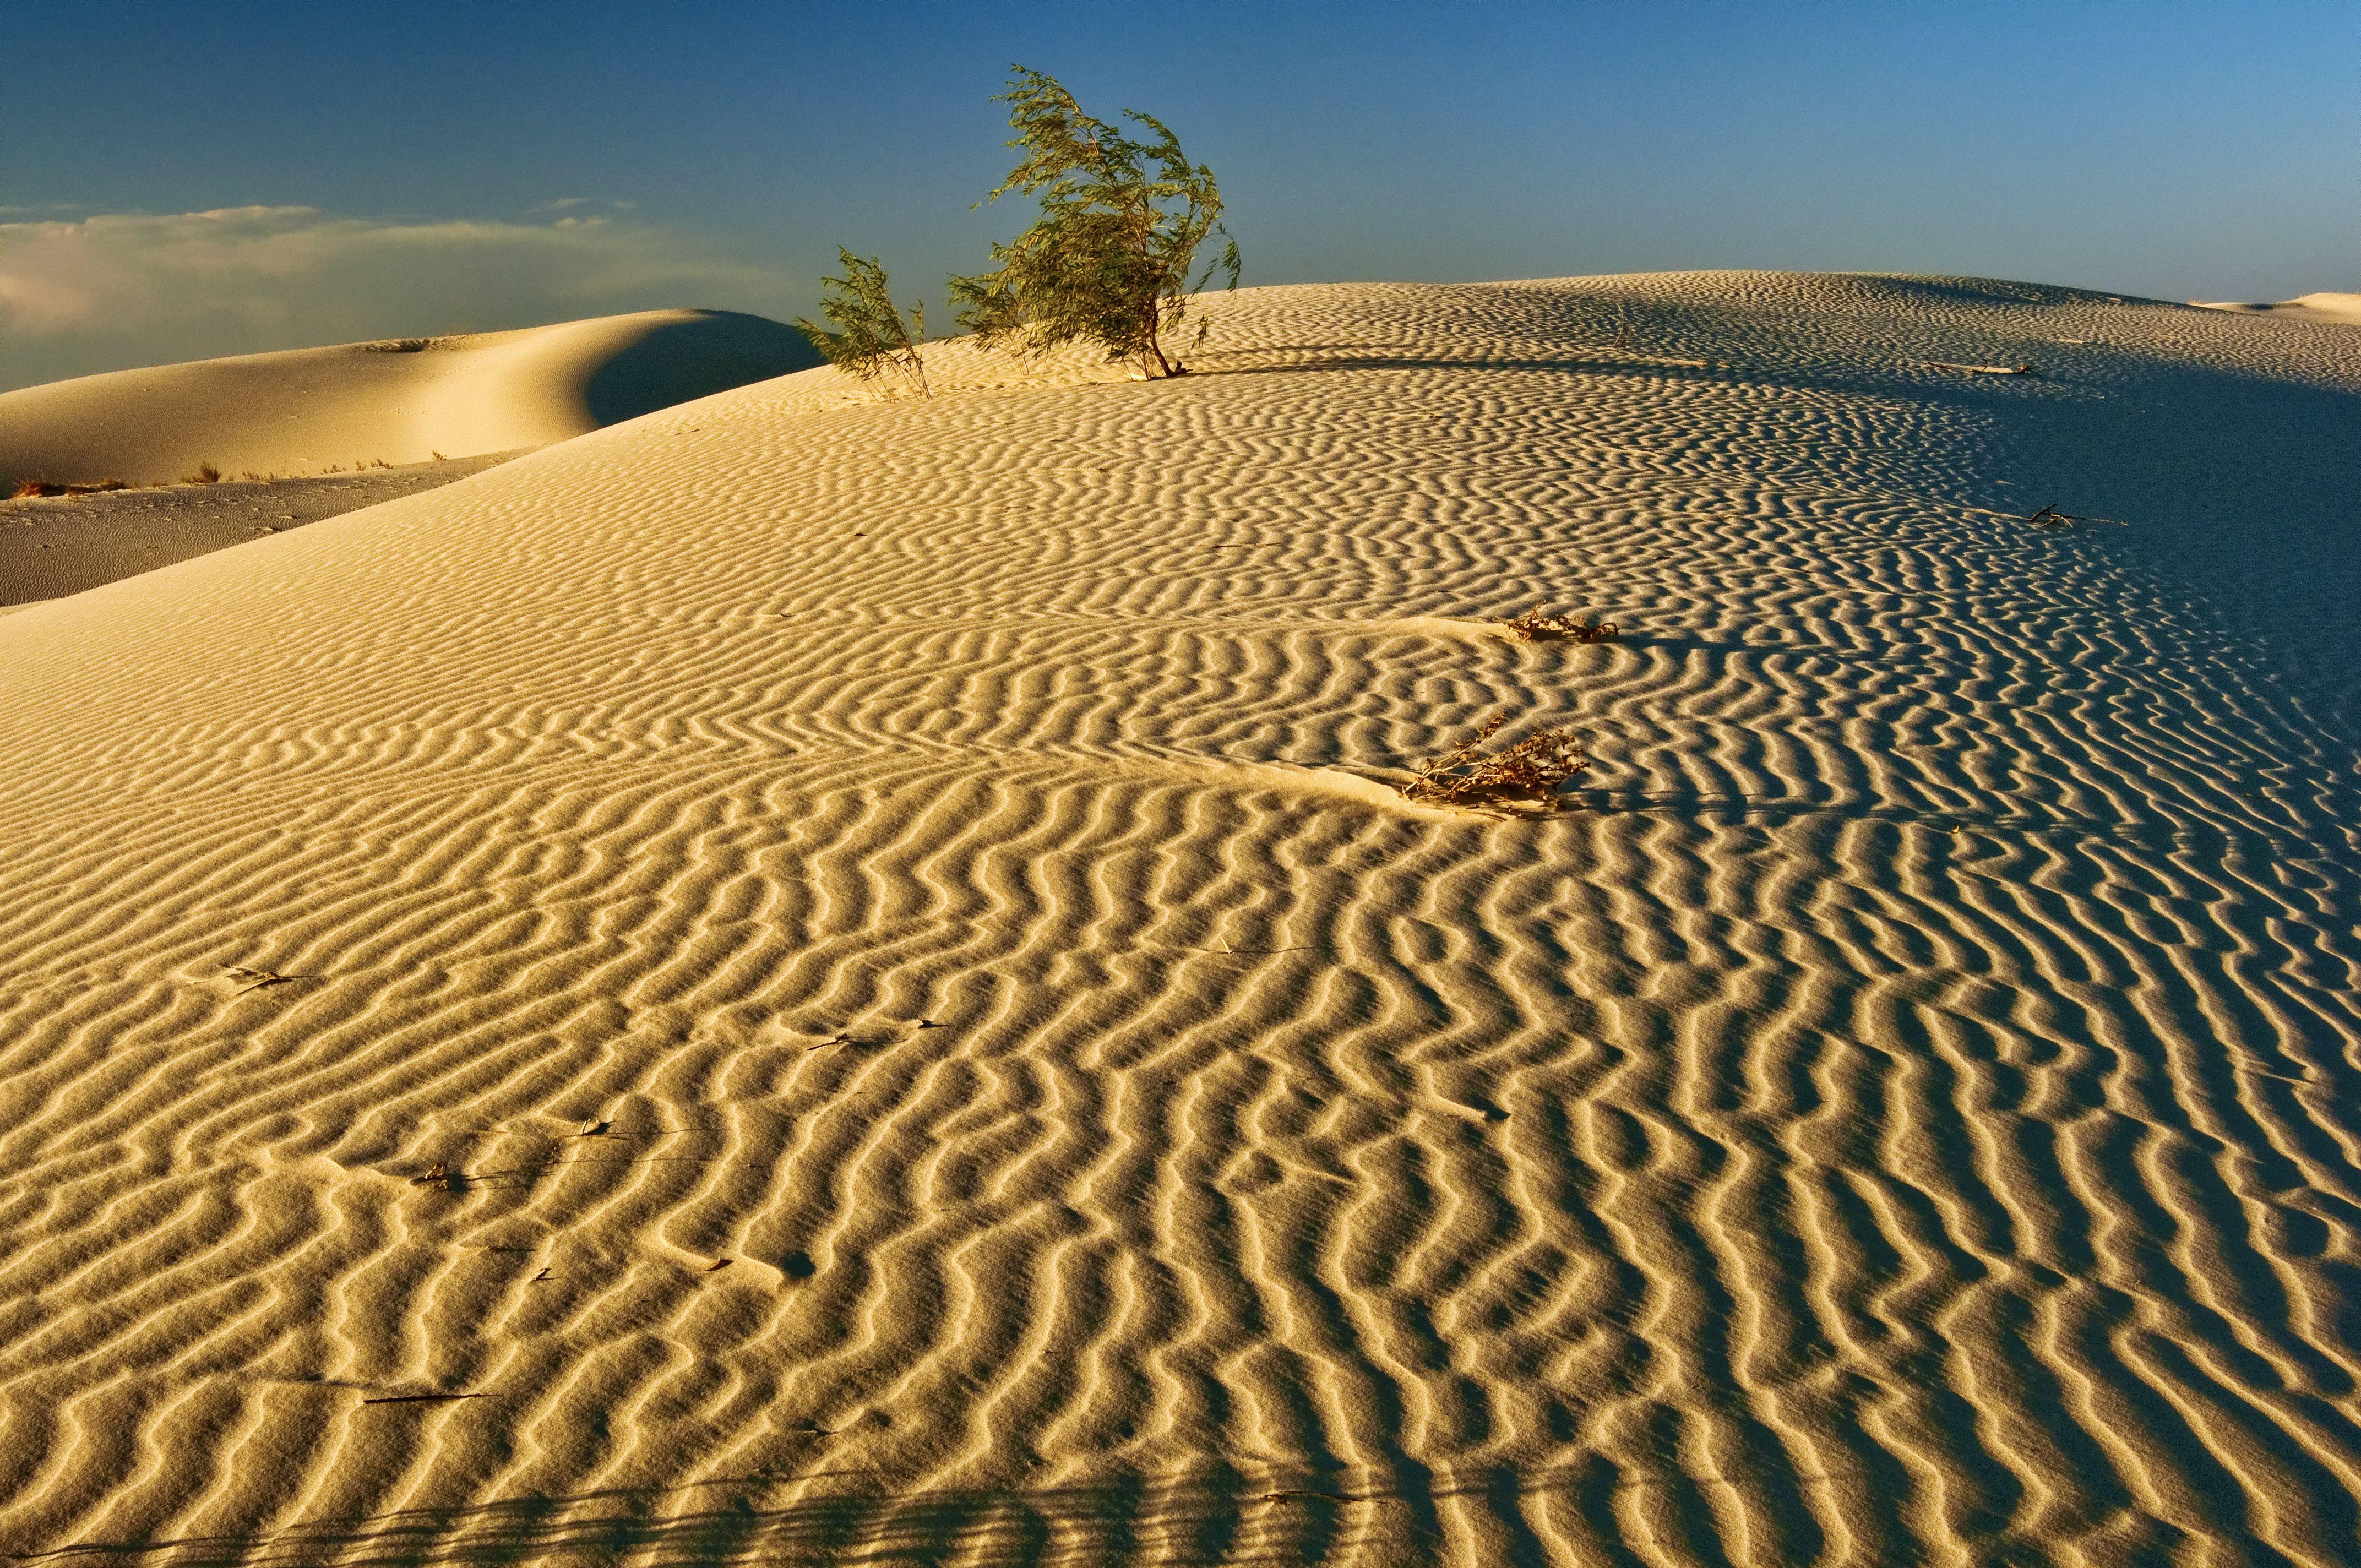 Dunes at sunset, Monahans Sandhills State Park, Chihuahuan Desert, Texas, USA